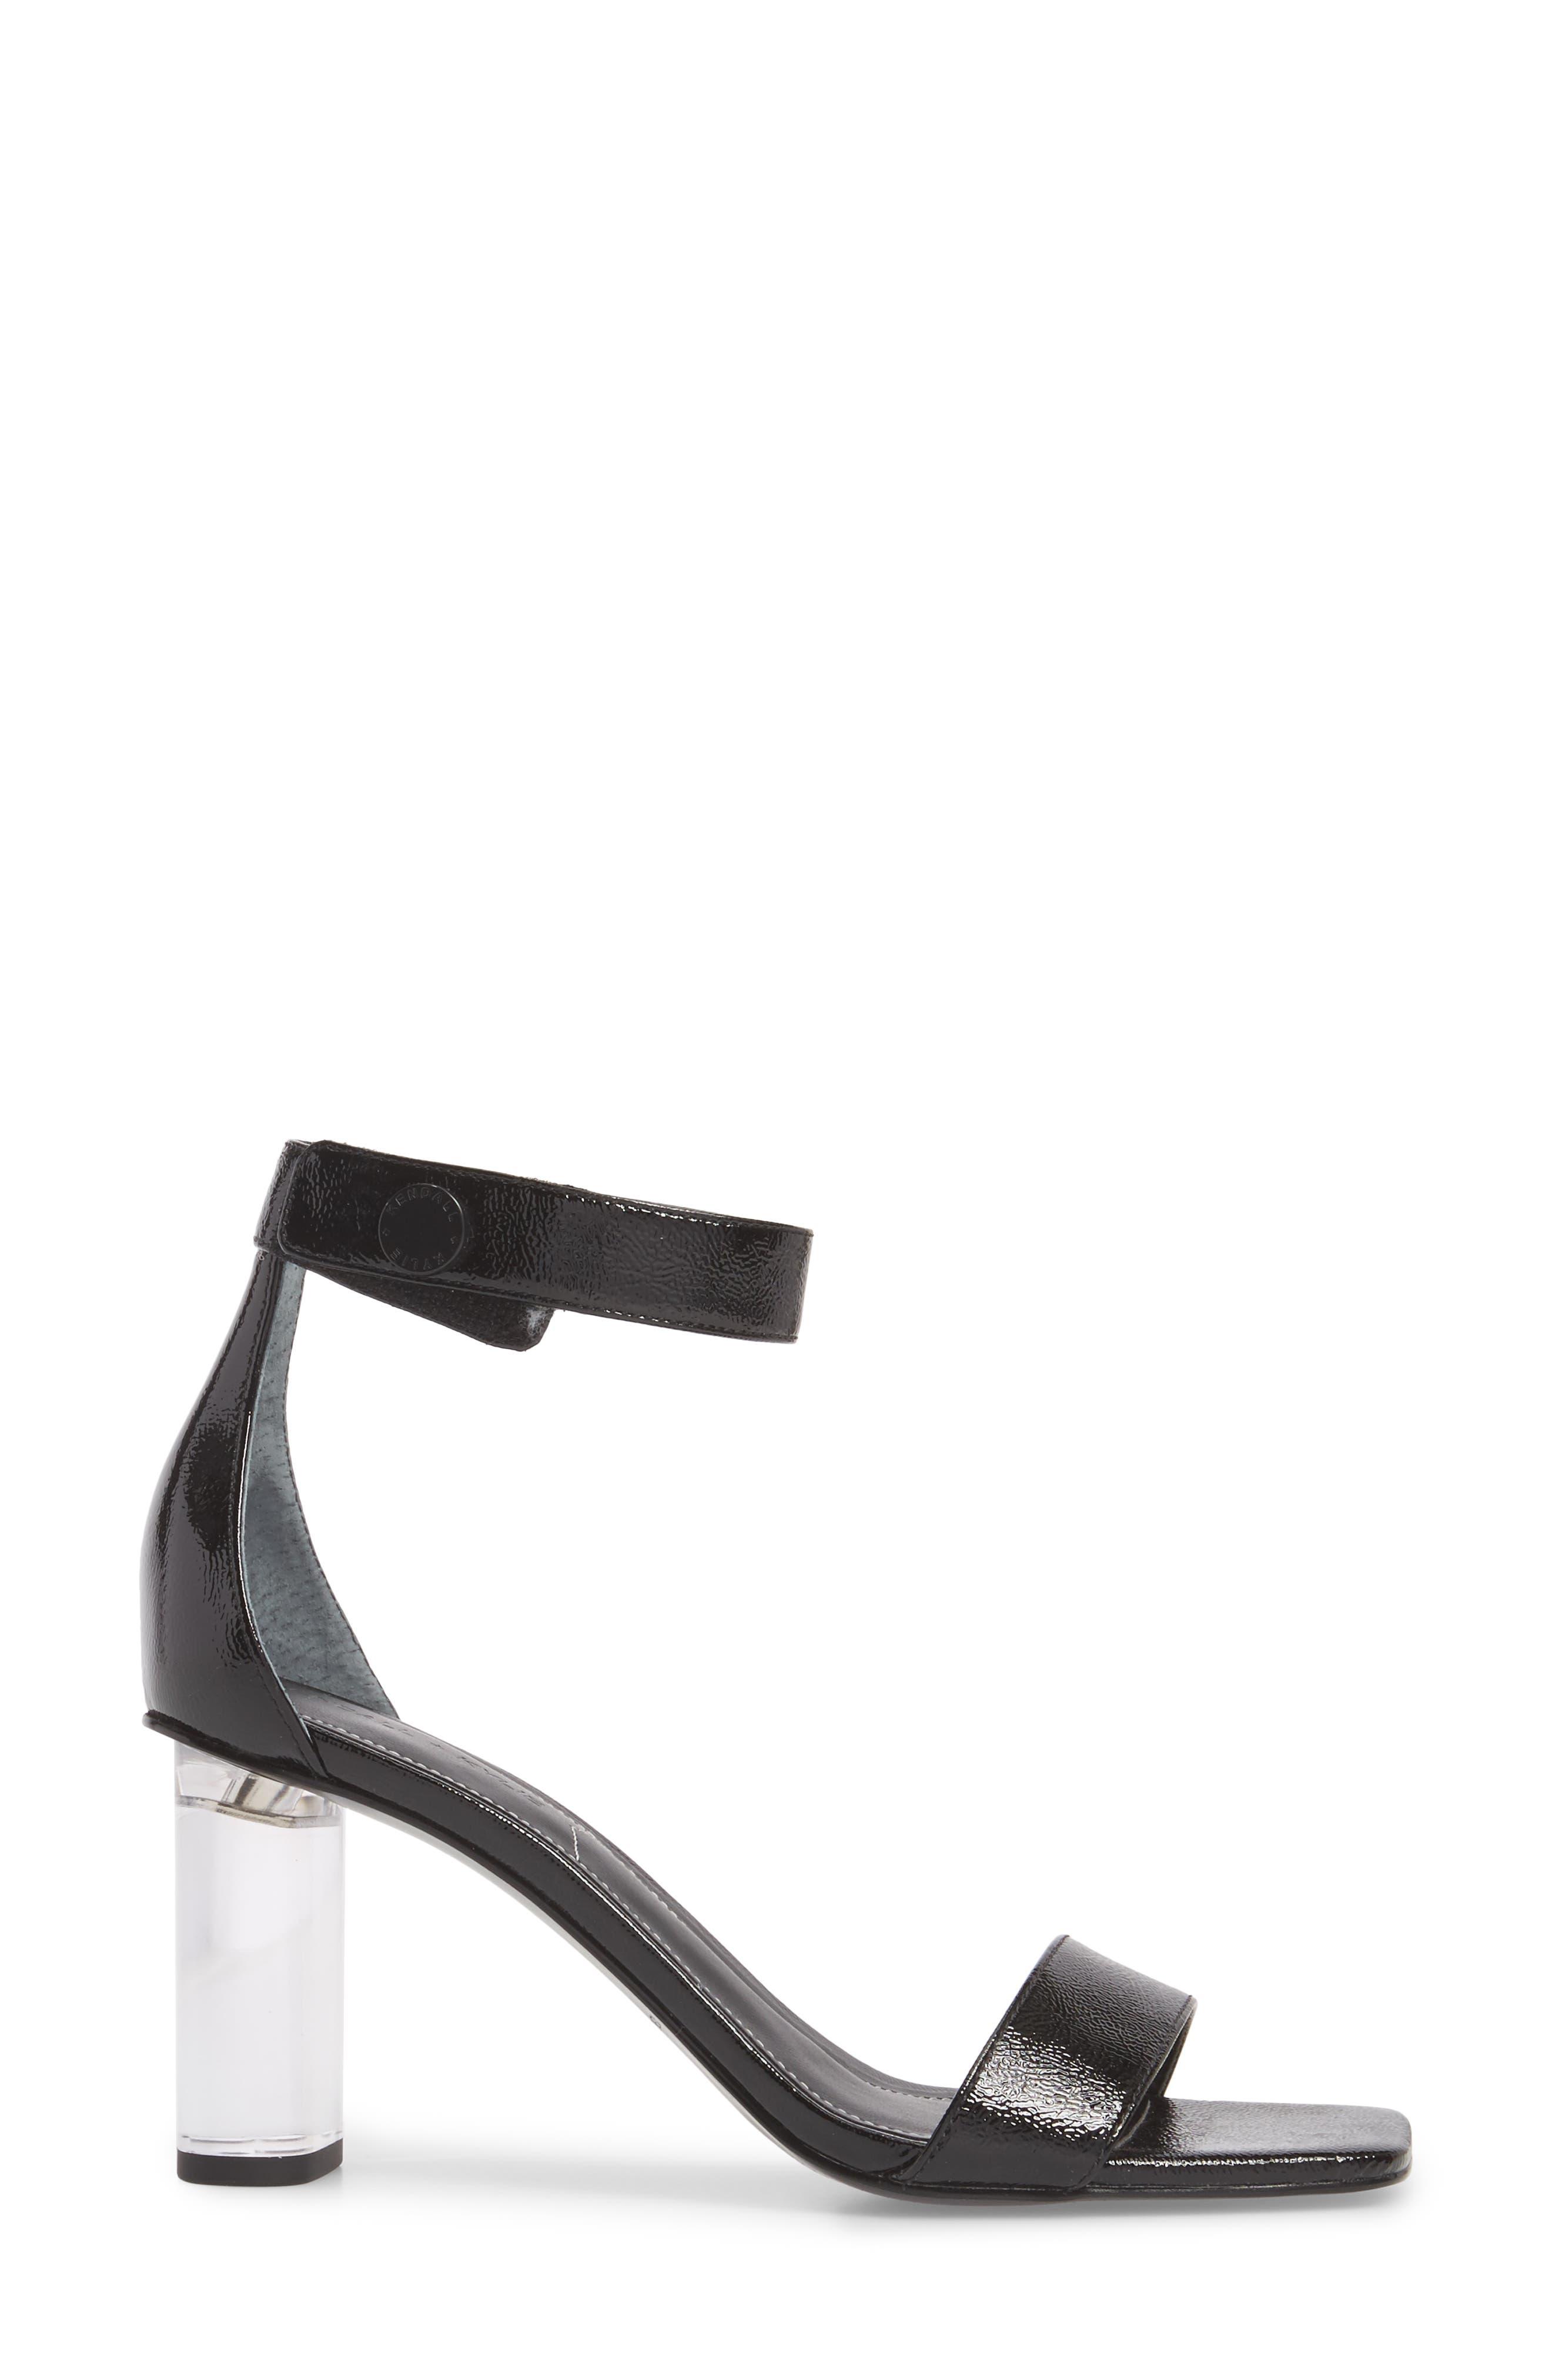 Lexx Ankle Strap Sandal,                             Alternate thumbnail 3, color,                             BLACK